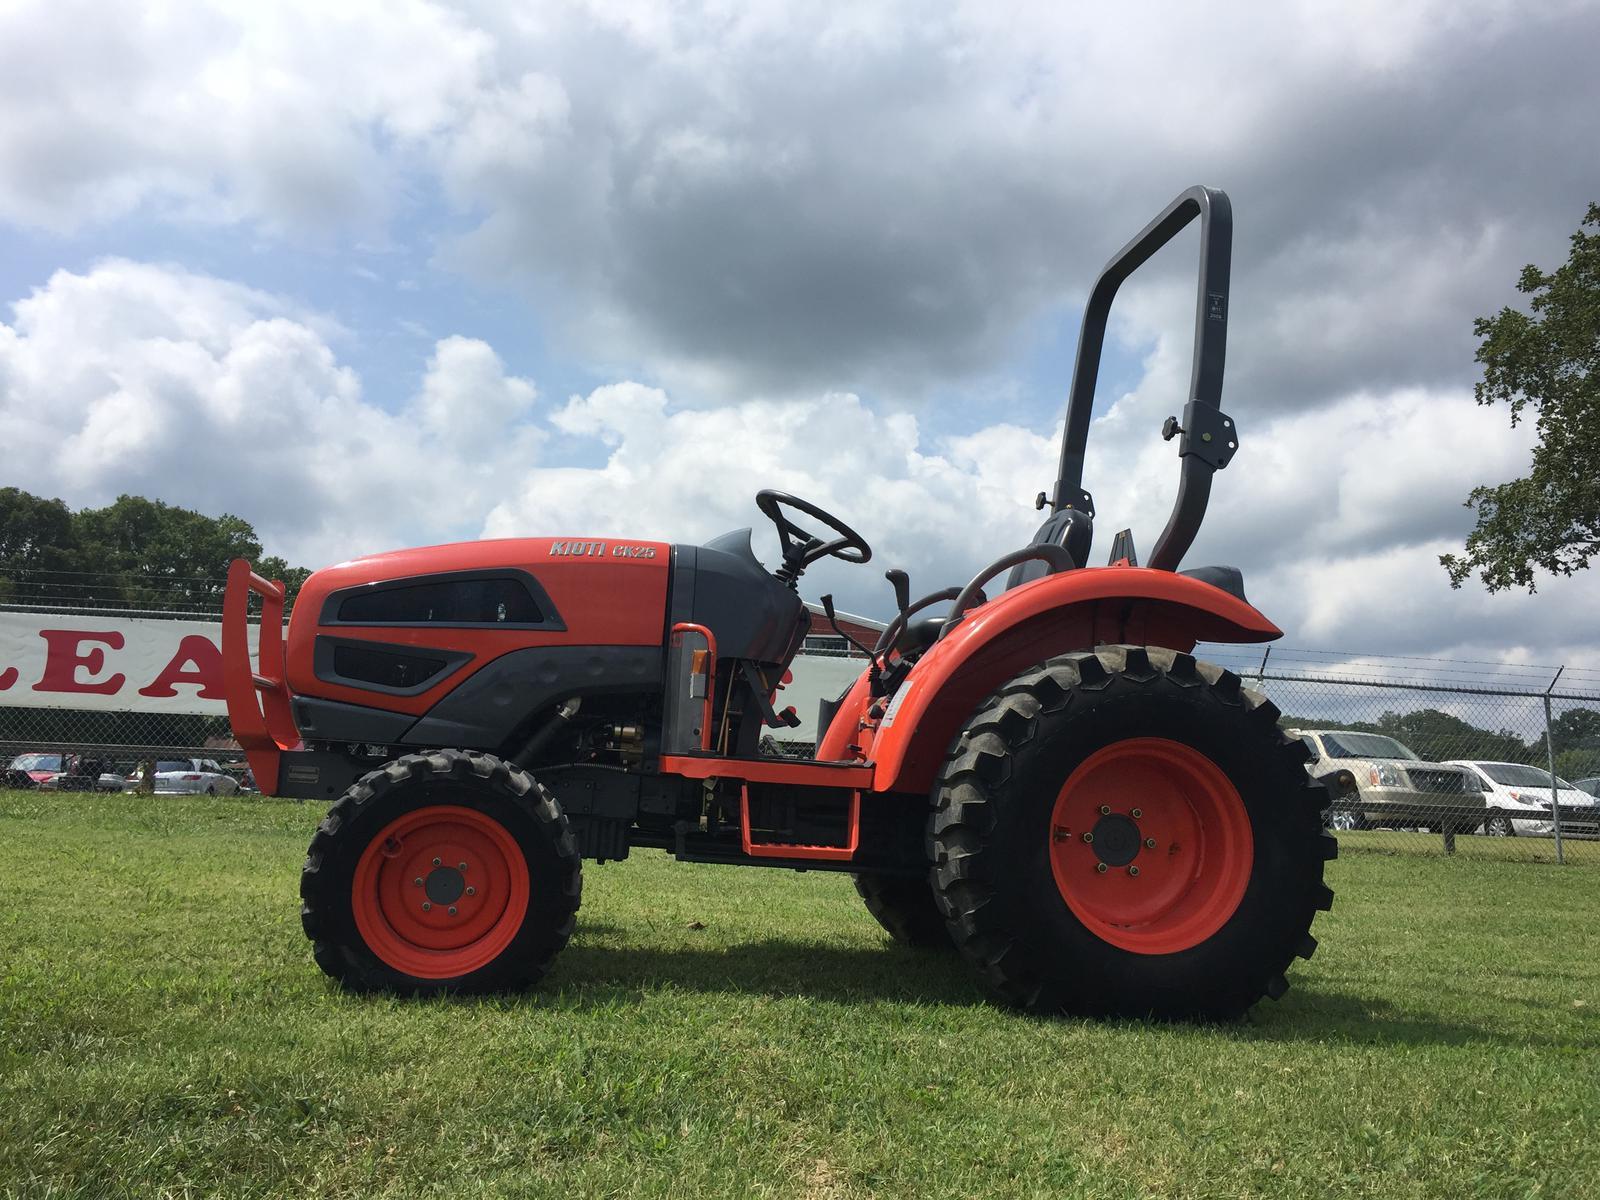 hight resolution of 2009 kioti ck25 for sale in cleveland tn homestead lawn tractor img 4805 kioti ck25 wiring diagram